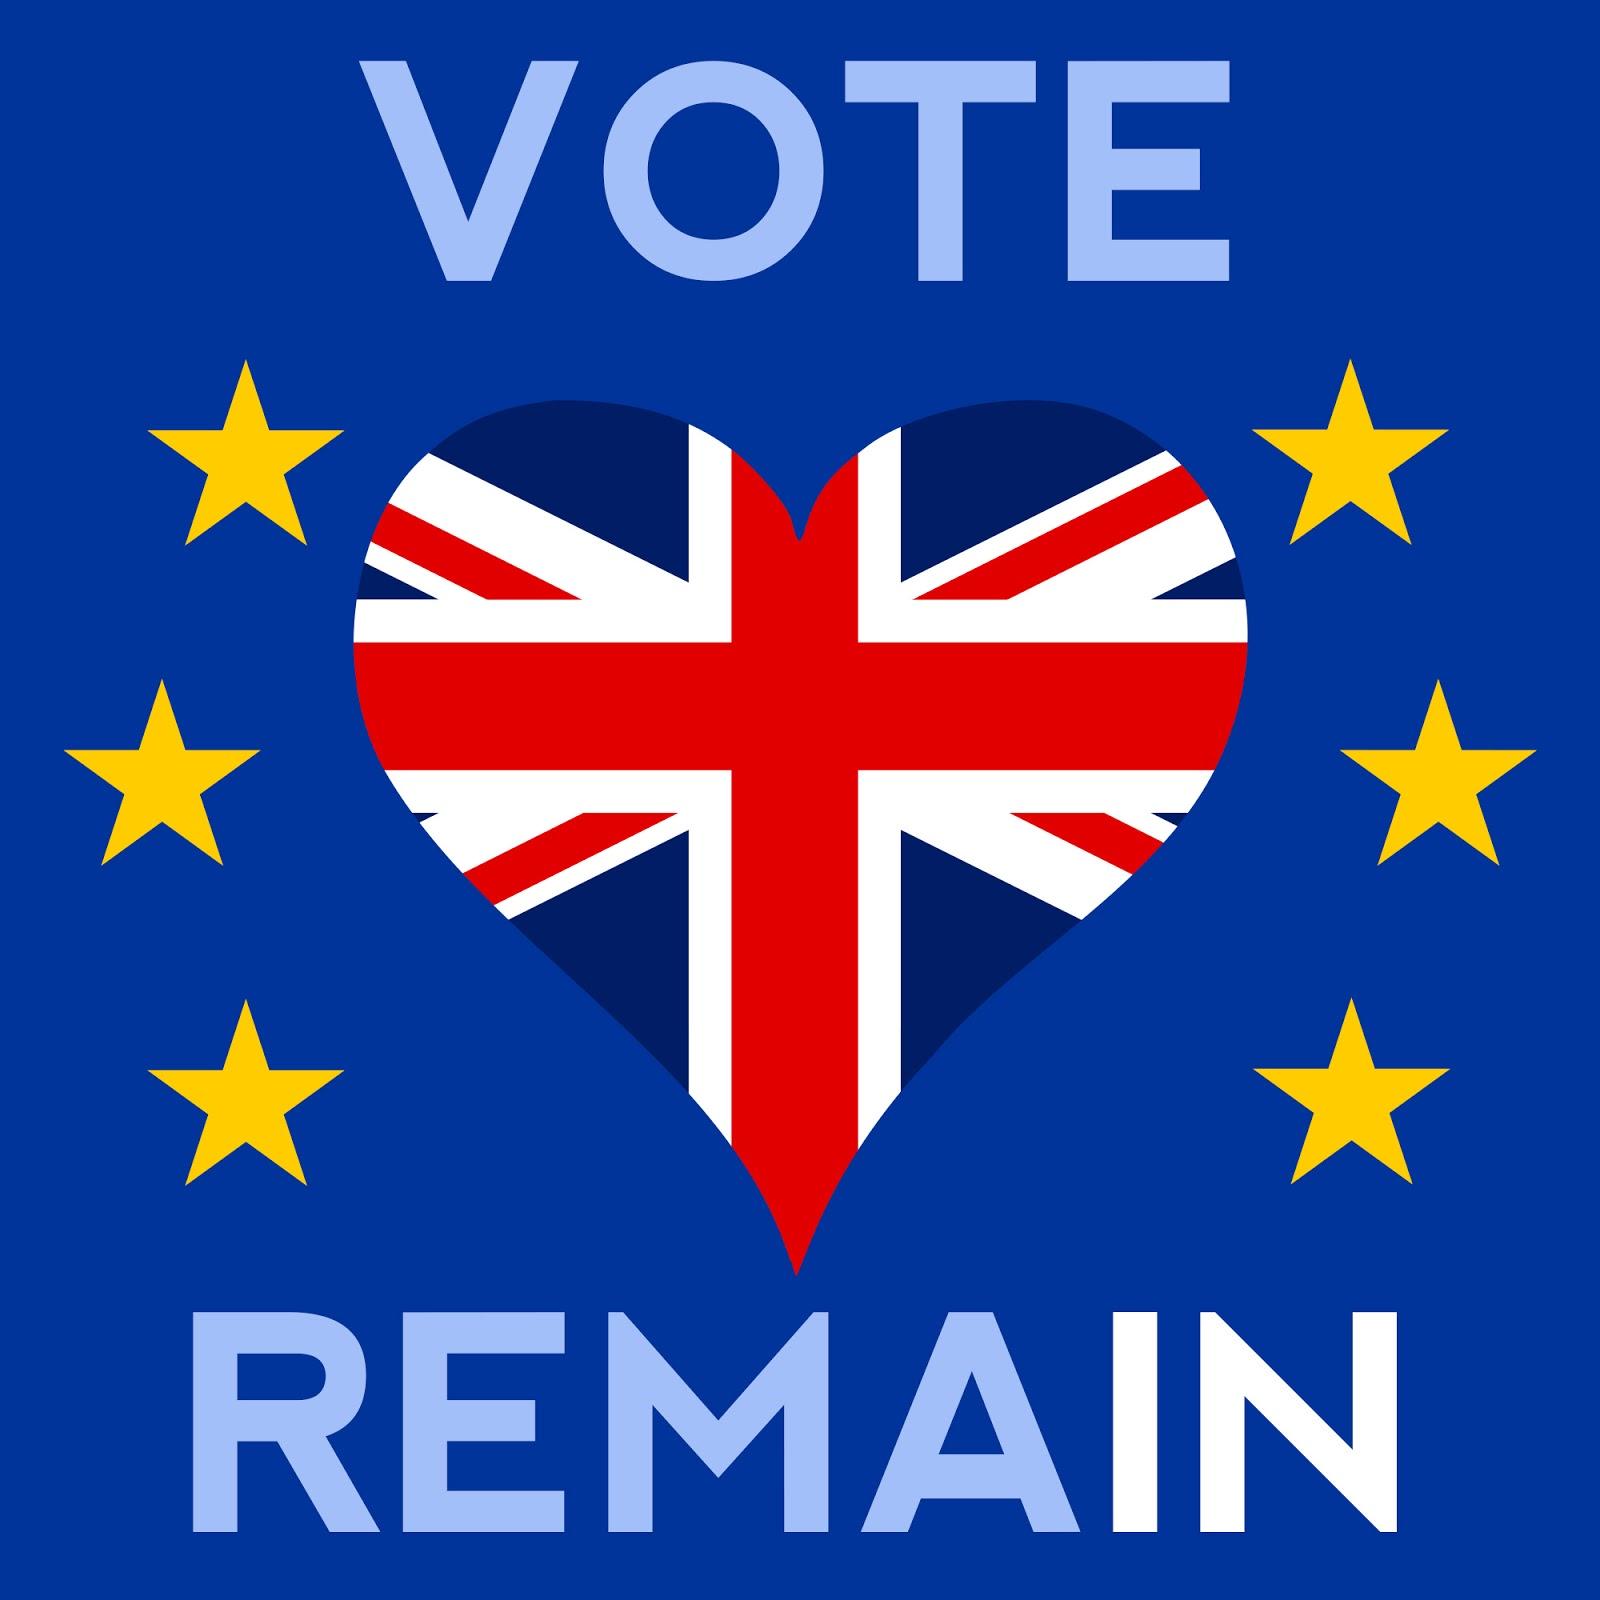 Jez Kemp's Blog: Vote Remain, for a positive UK future